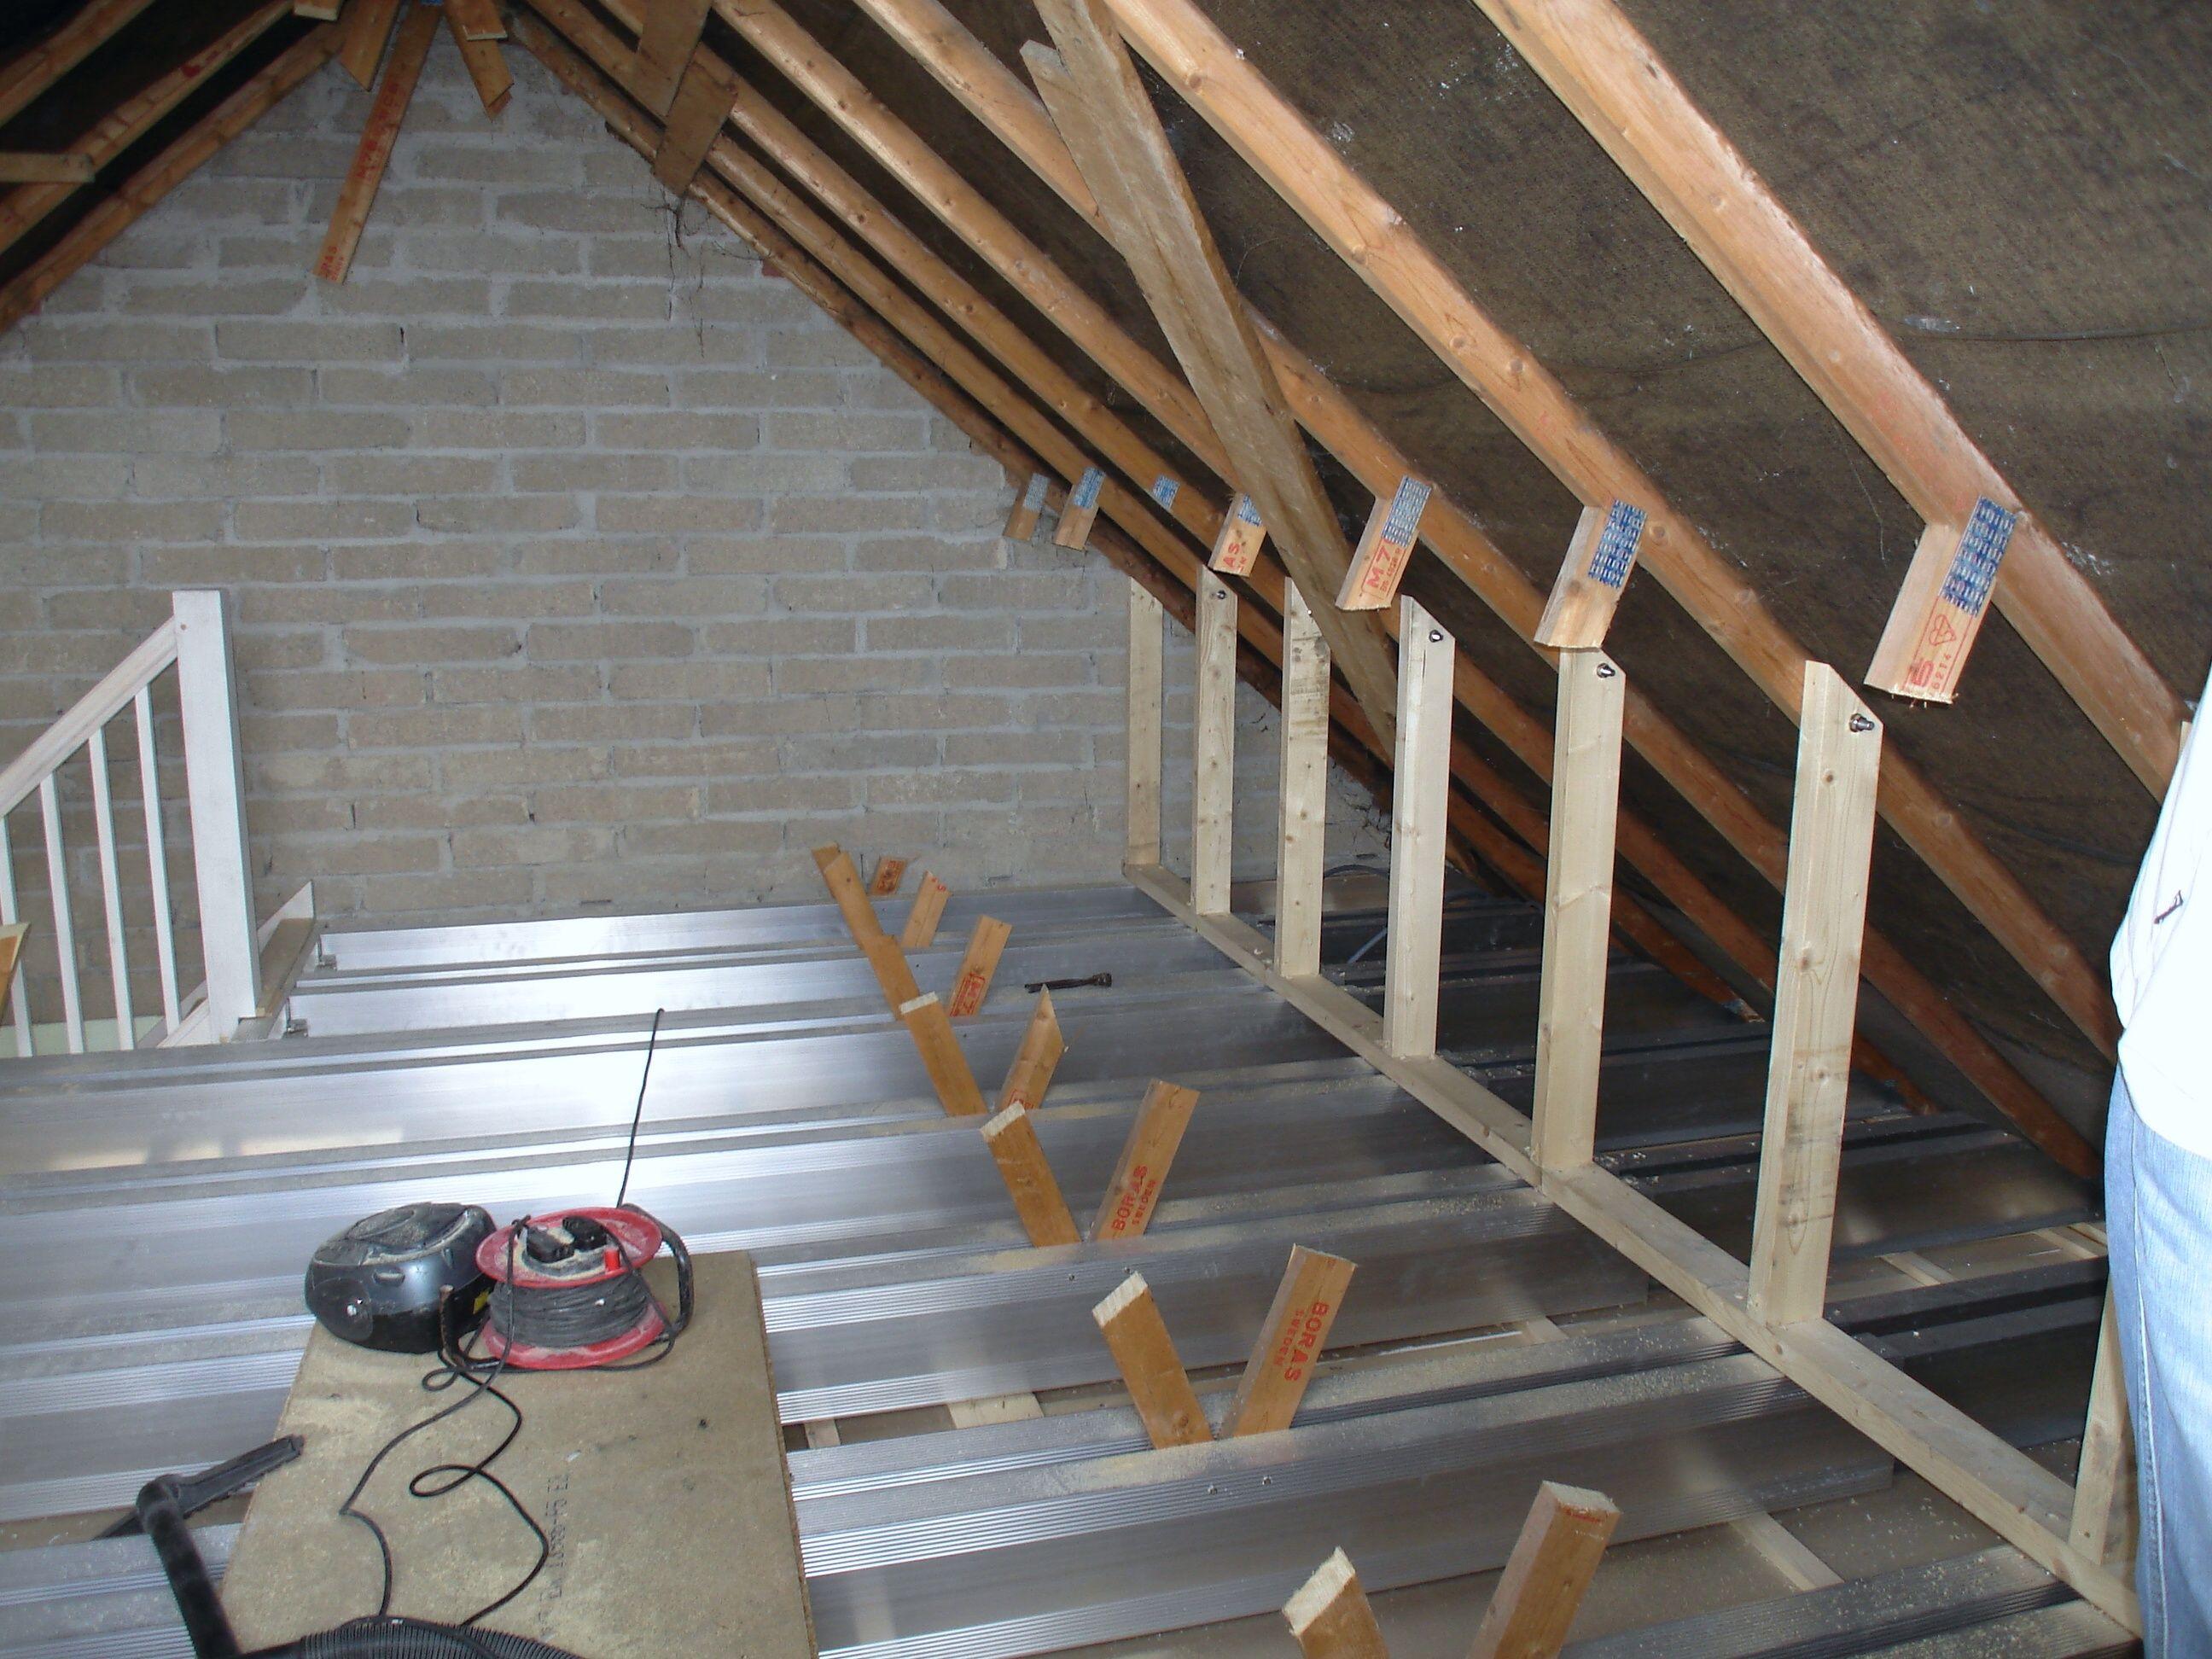 Attic Rooms Low Ceiling Knee Walls